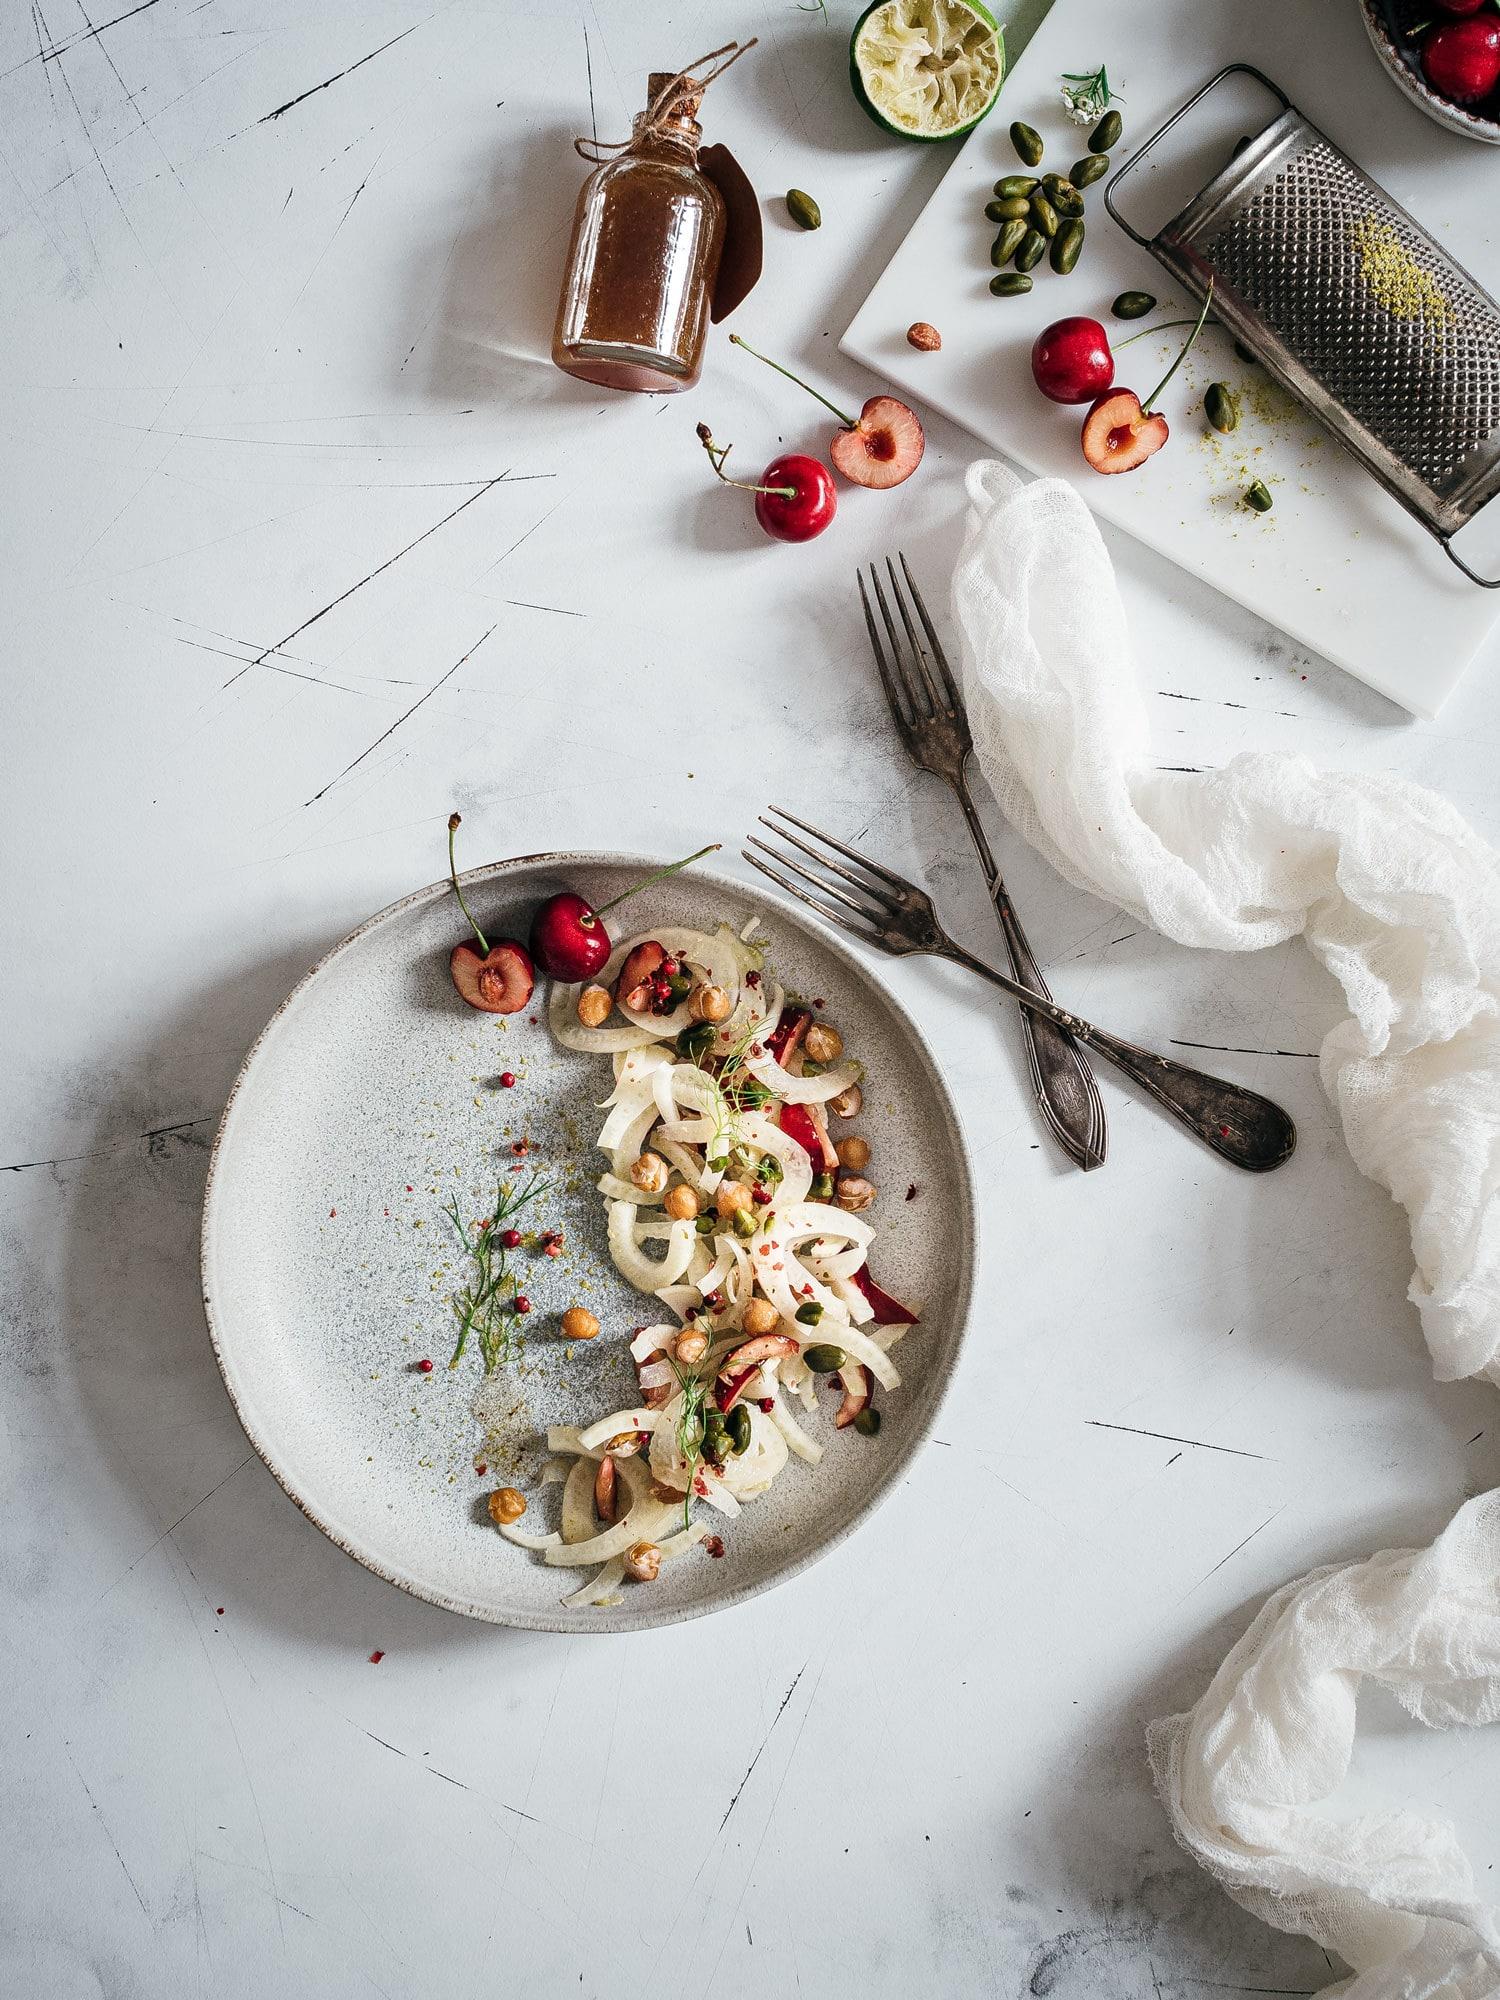 Fenchelsalat mit Himbeer-Limetten-Sumach Dressing